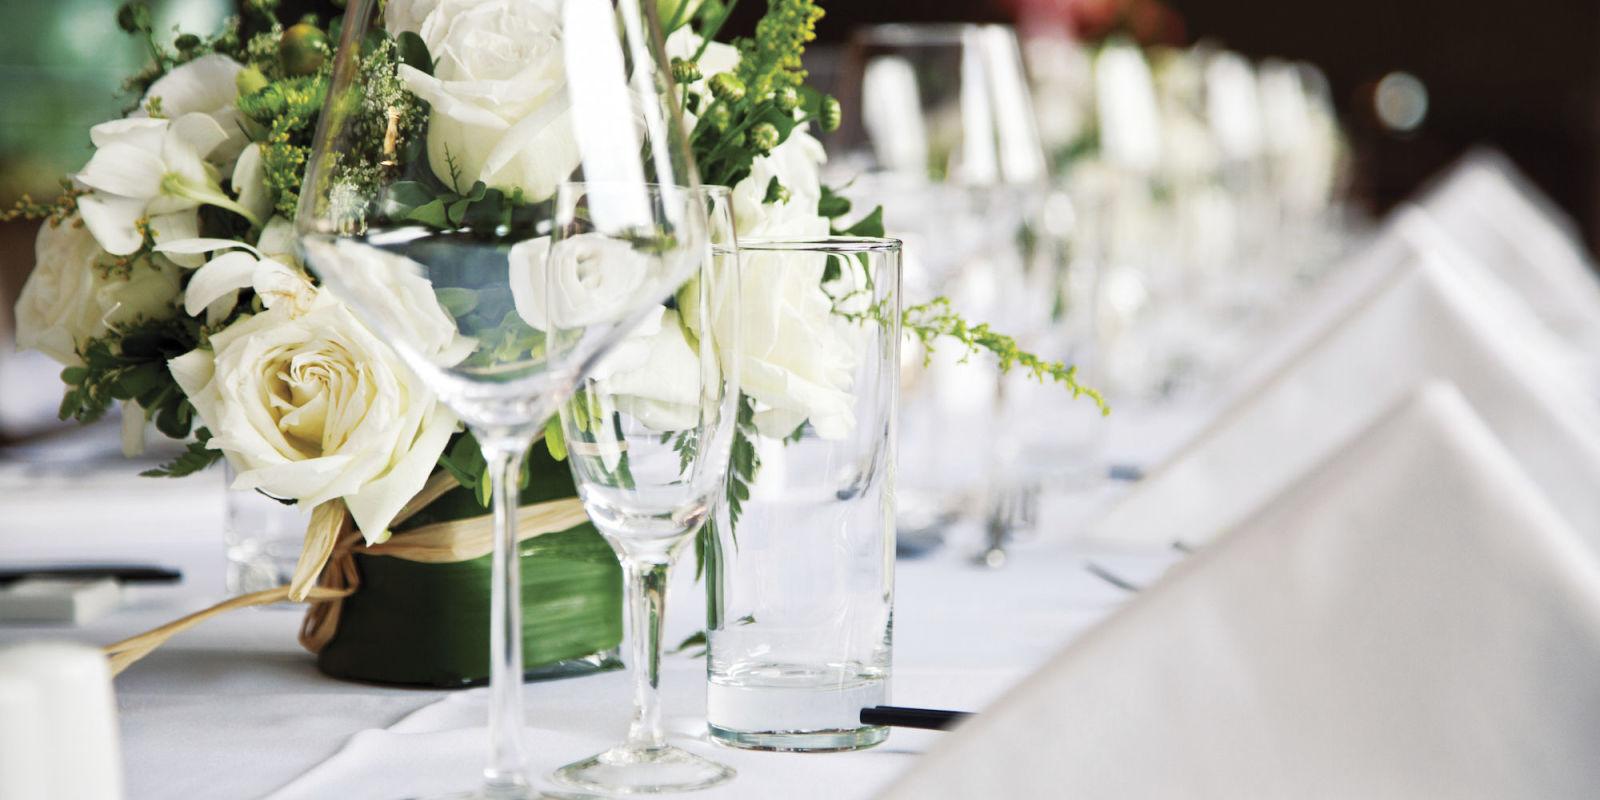 Wedding Chapel Ceremony – 12 Unspoken Wedding Etiquette Rules